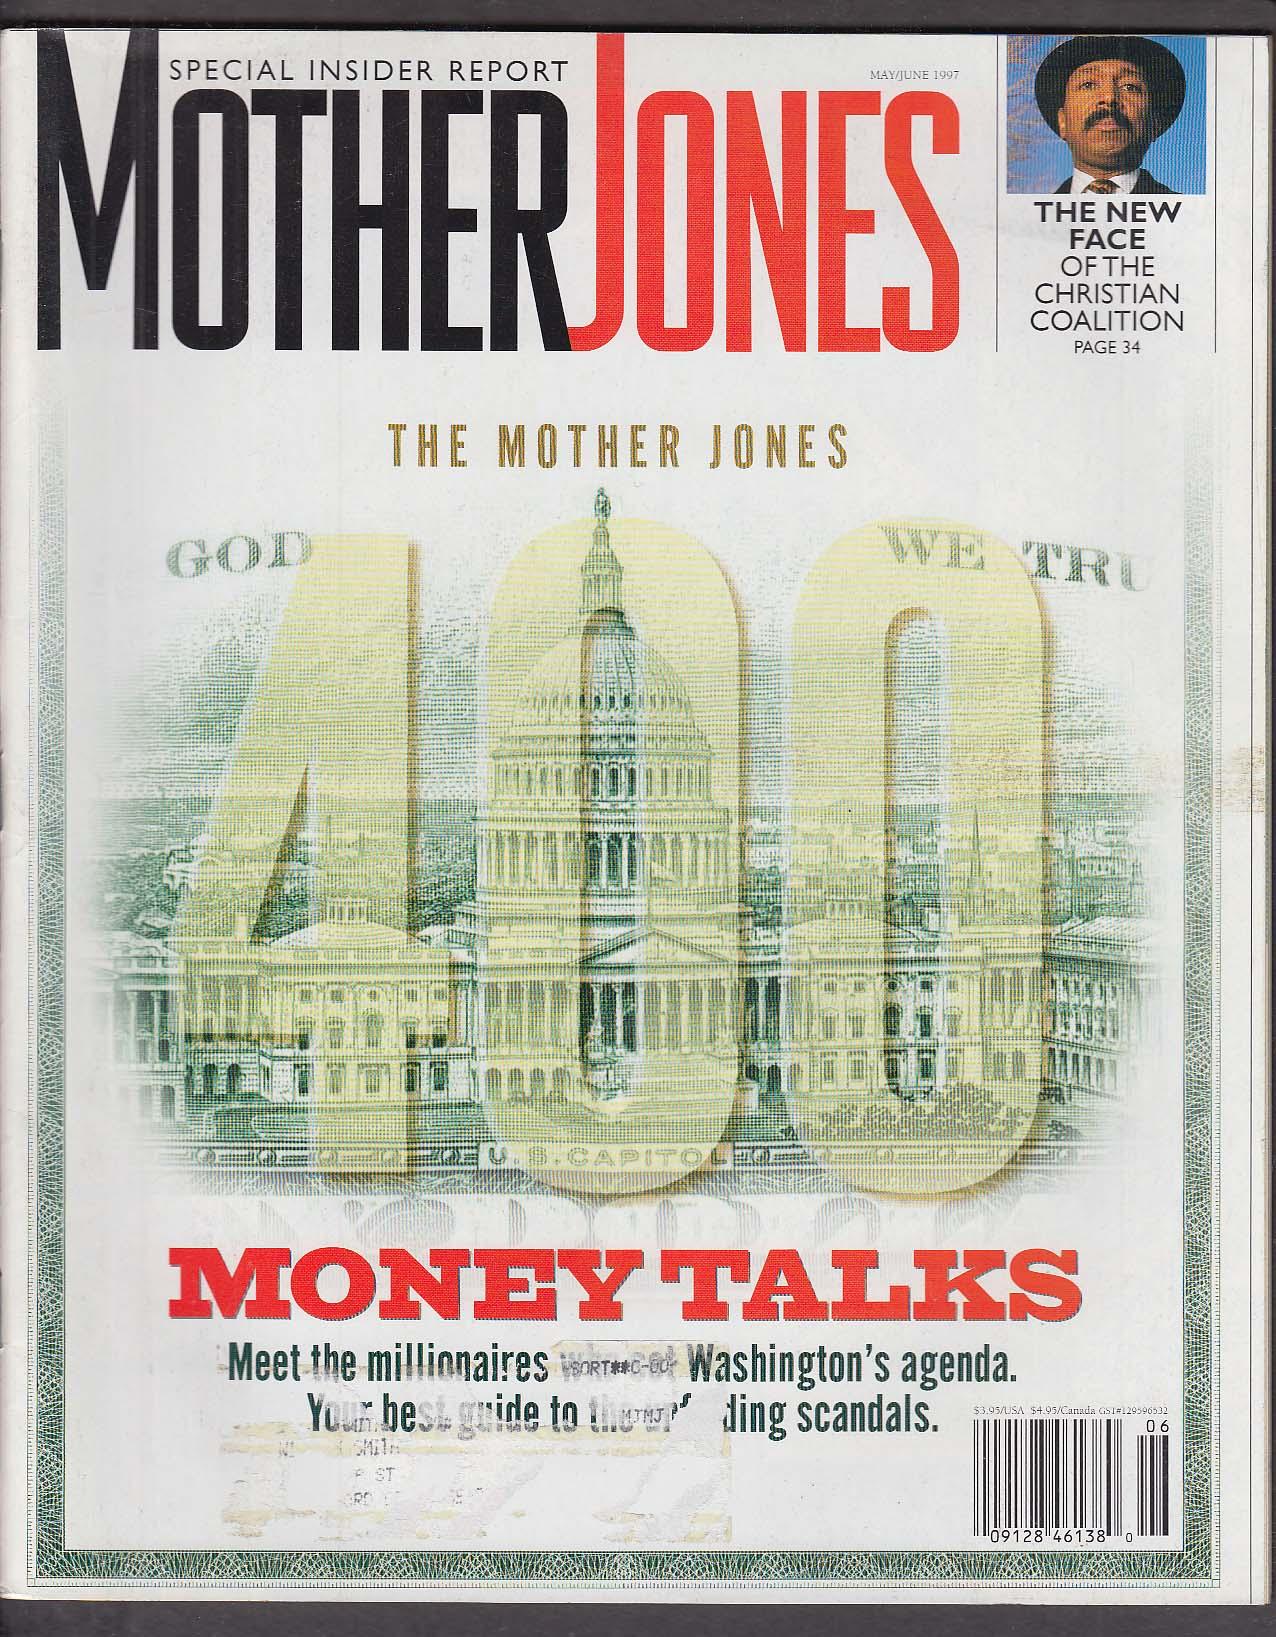 MOTHER JONES Arlie Hochschild Bill Clinton Paula Poundstone ++ 5-6 1997